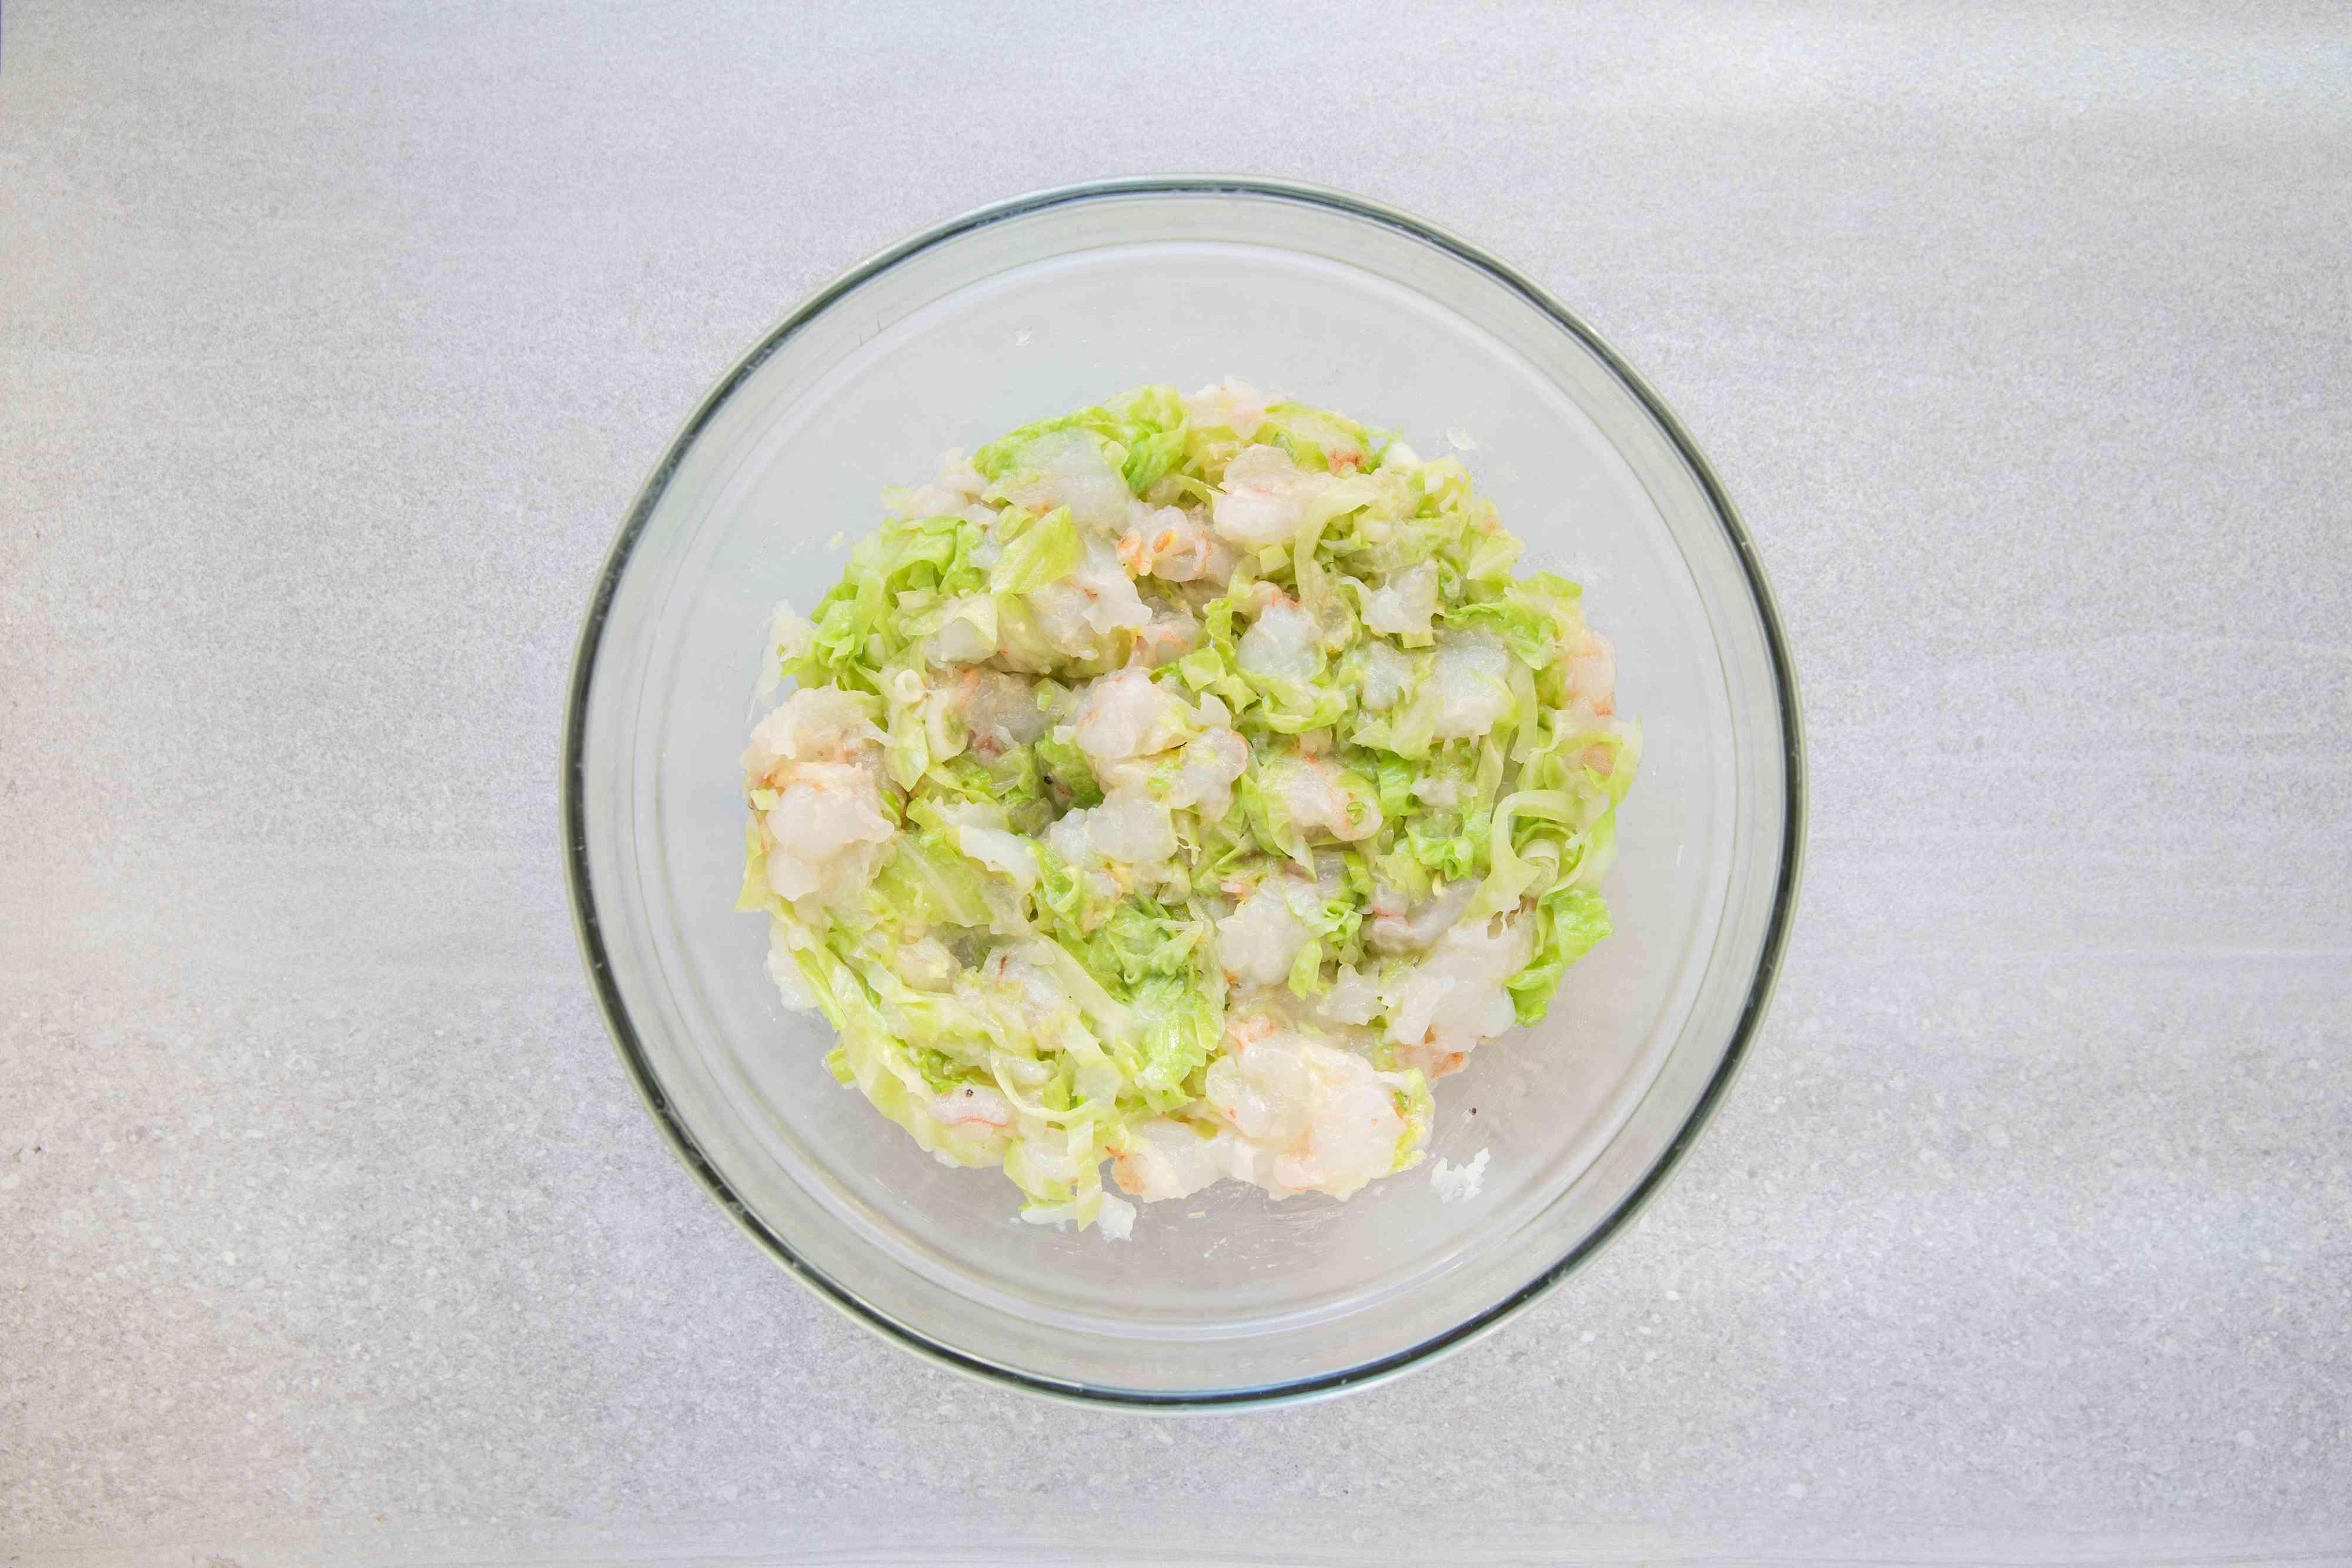 Add sake, salt, sesame oil, and katakuriko to the shrimp and cabbage mixture